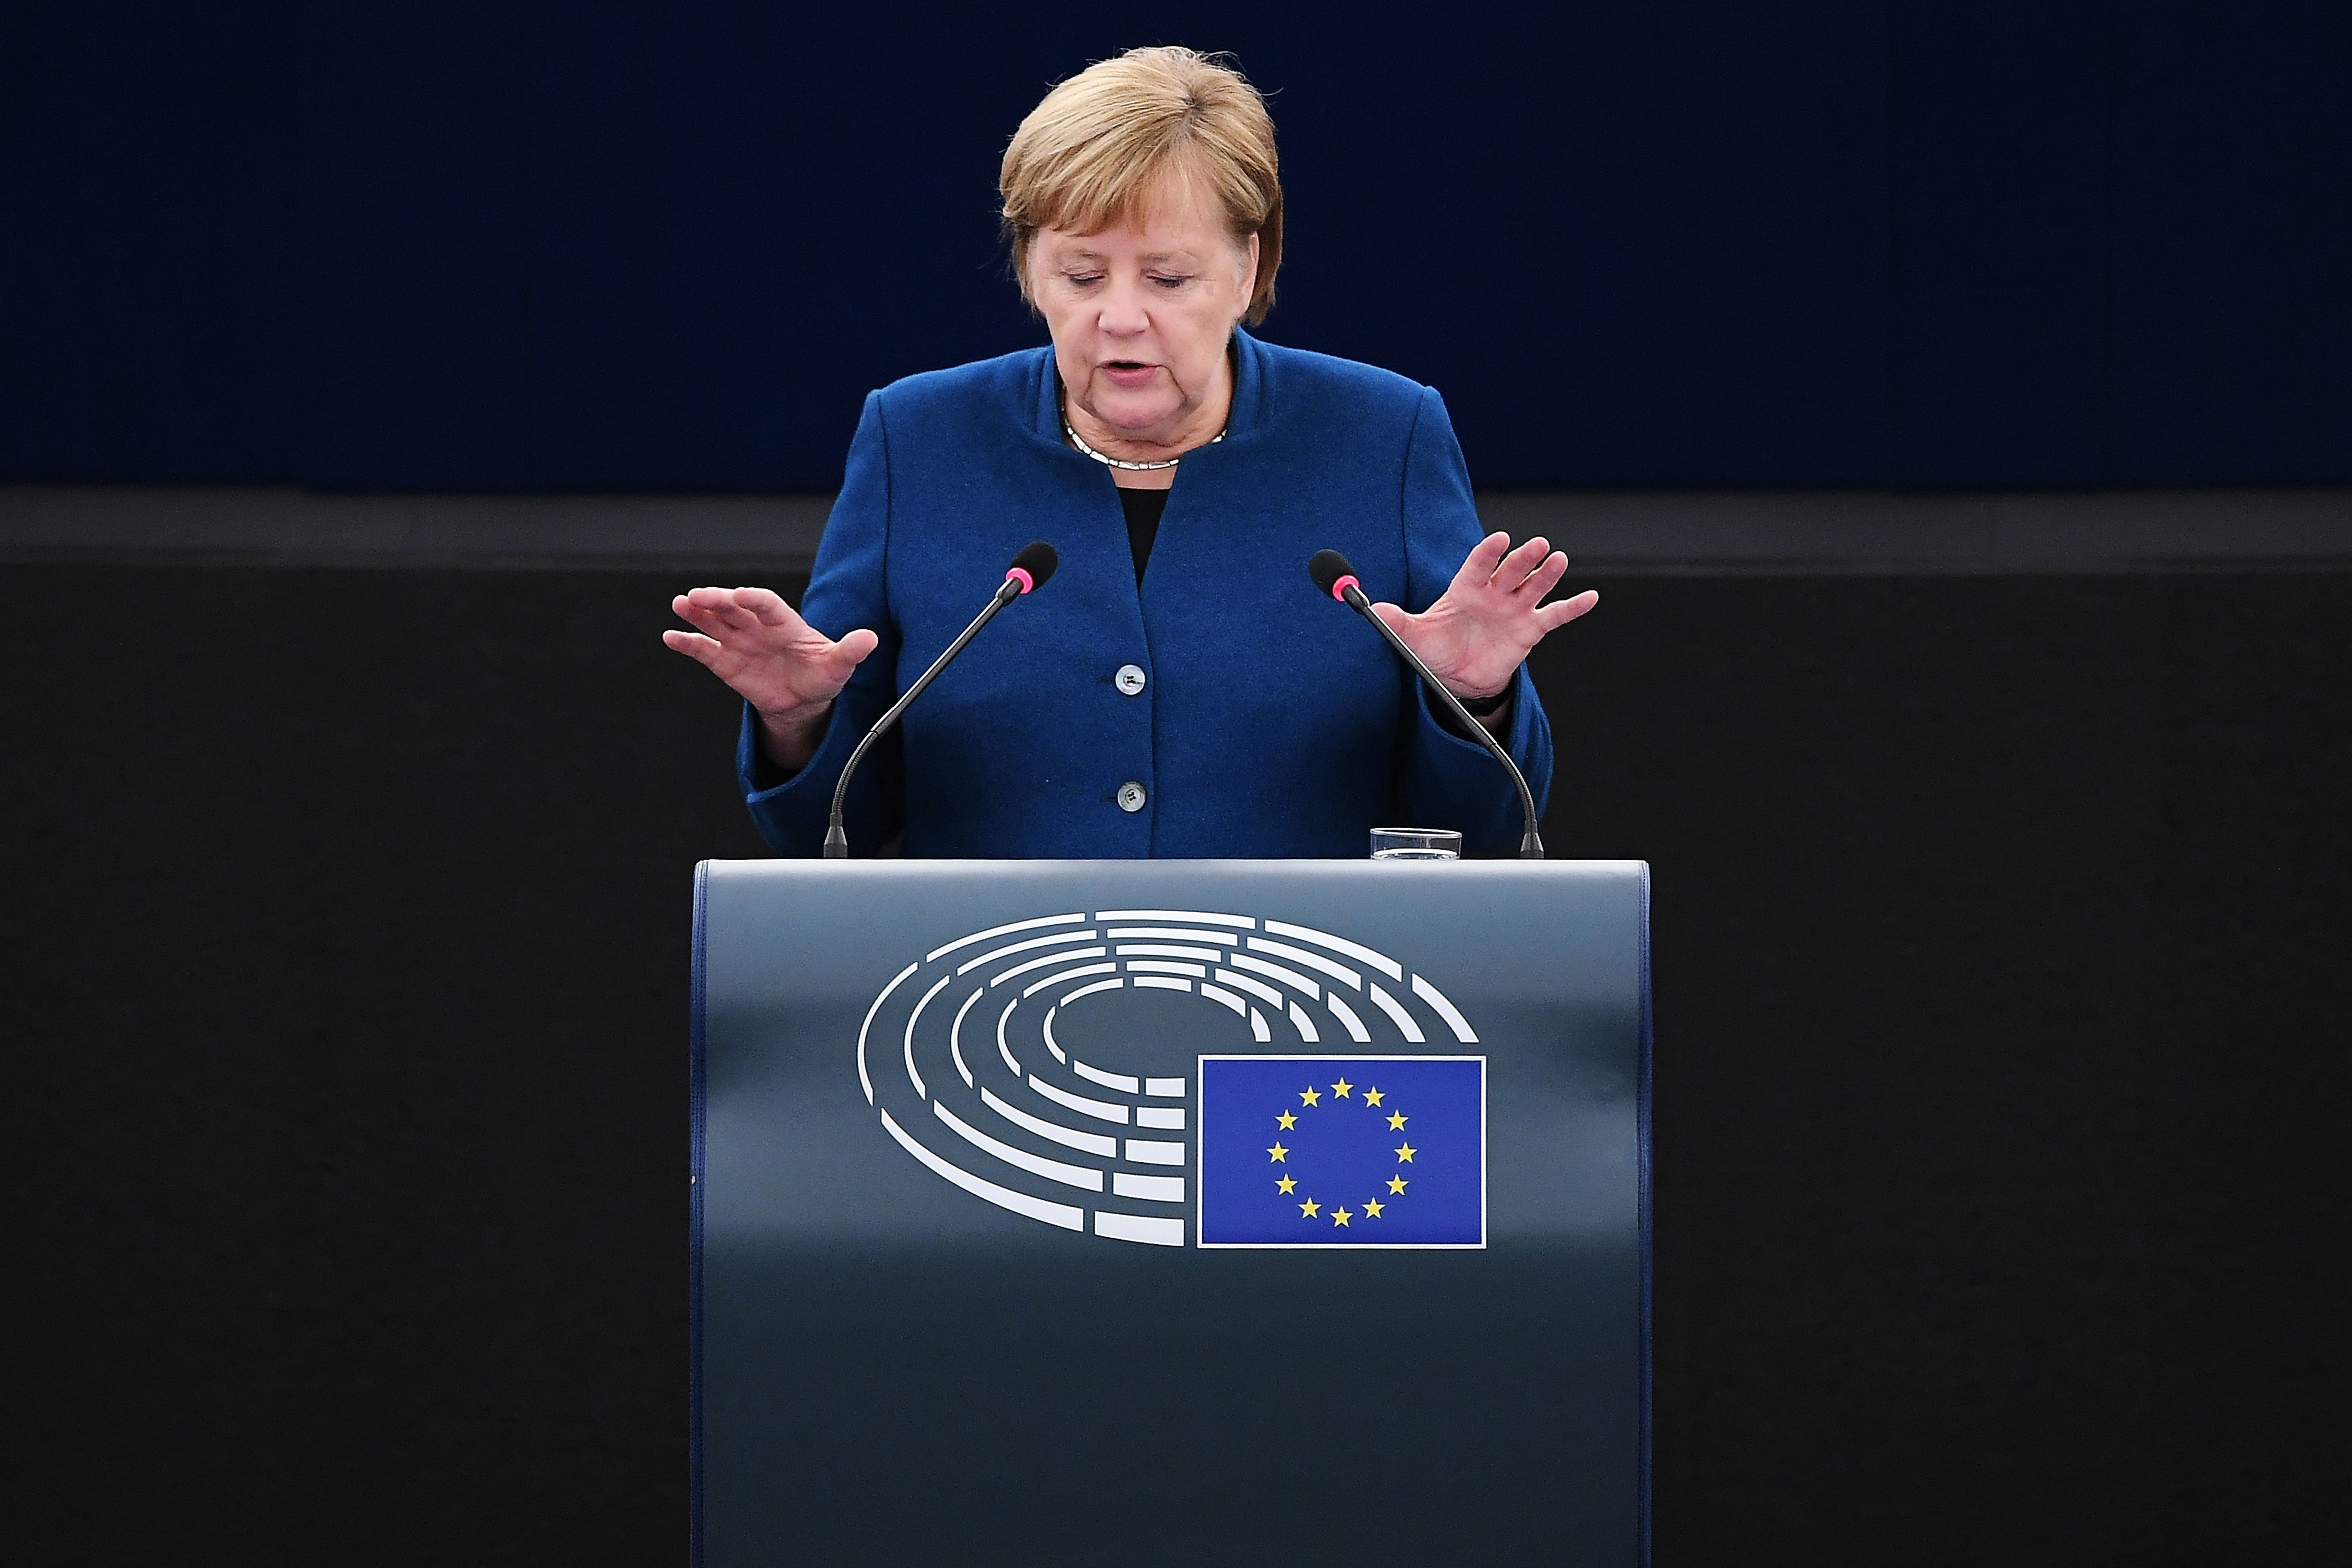 Merkel gesteht im EU-Parlament Fehler in Flüchtlingspolitik